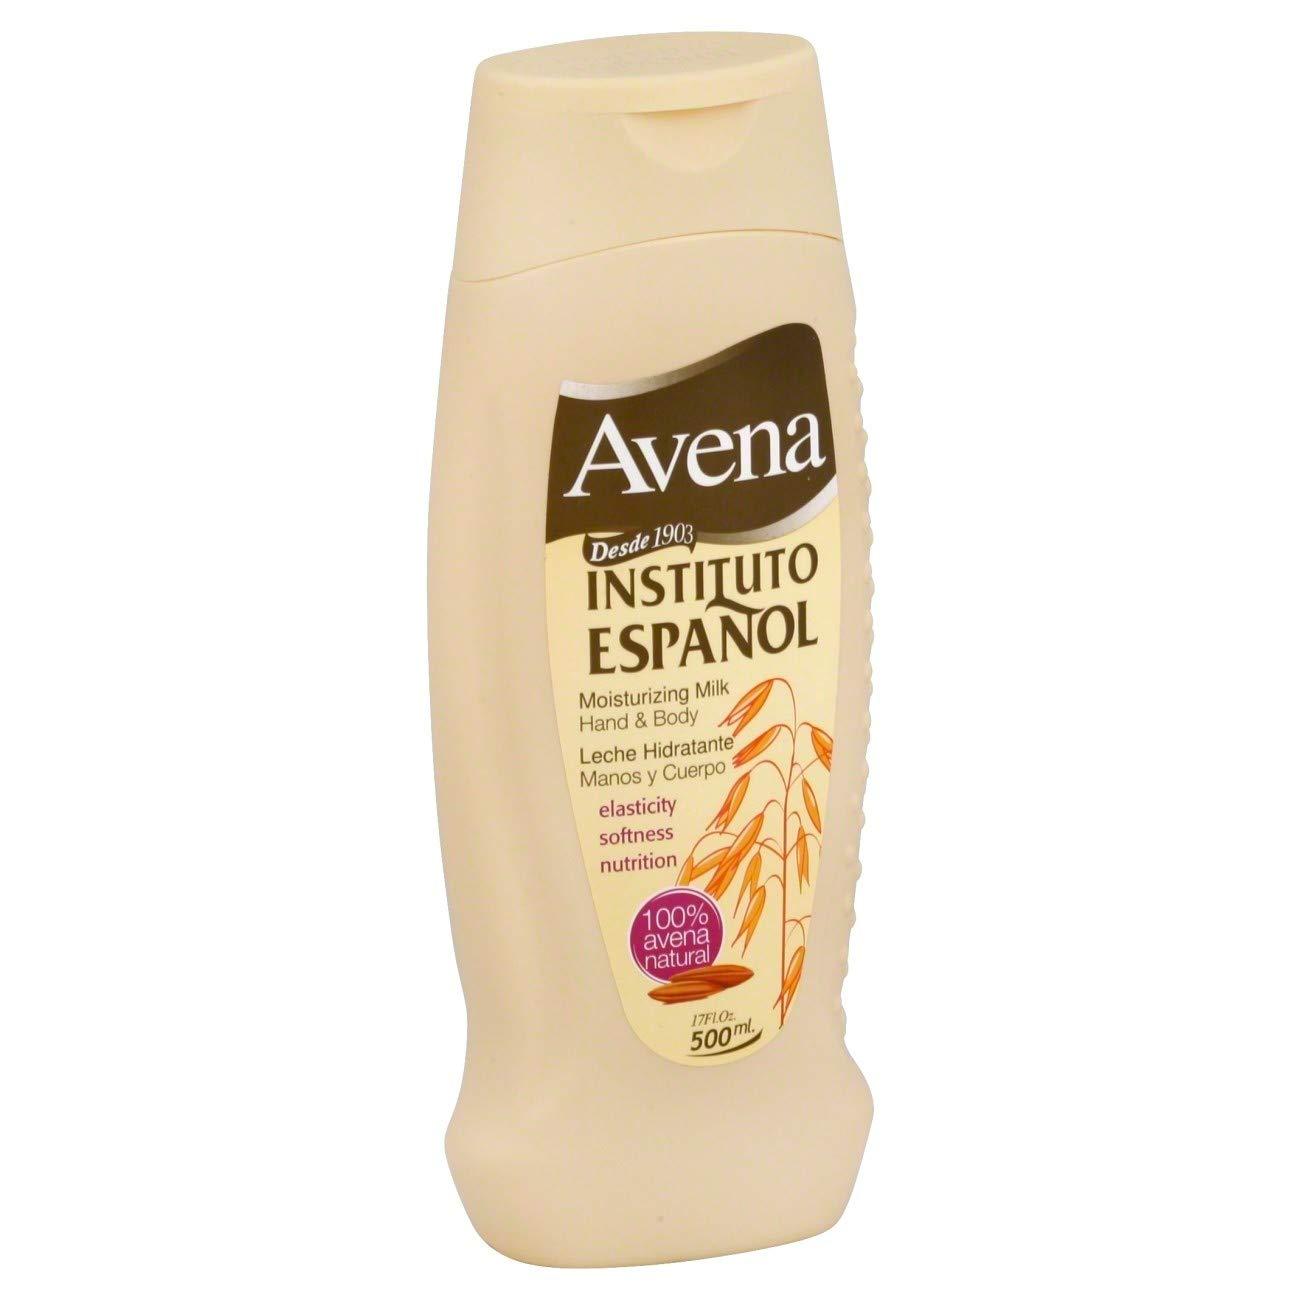 Translated Avena Moisturizing Superlatite Milk Hand Body Lotion 17 Pack 6 oz of